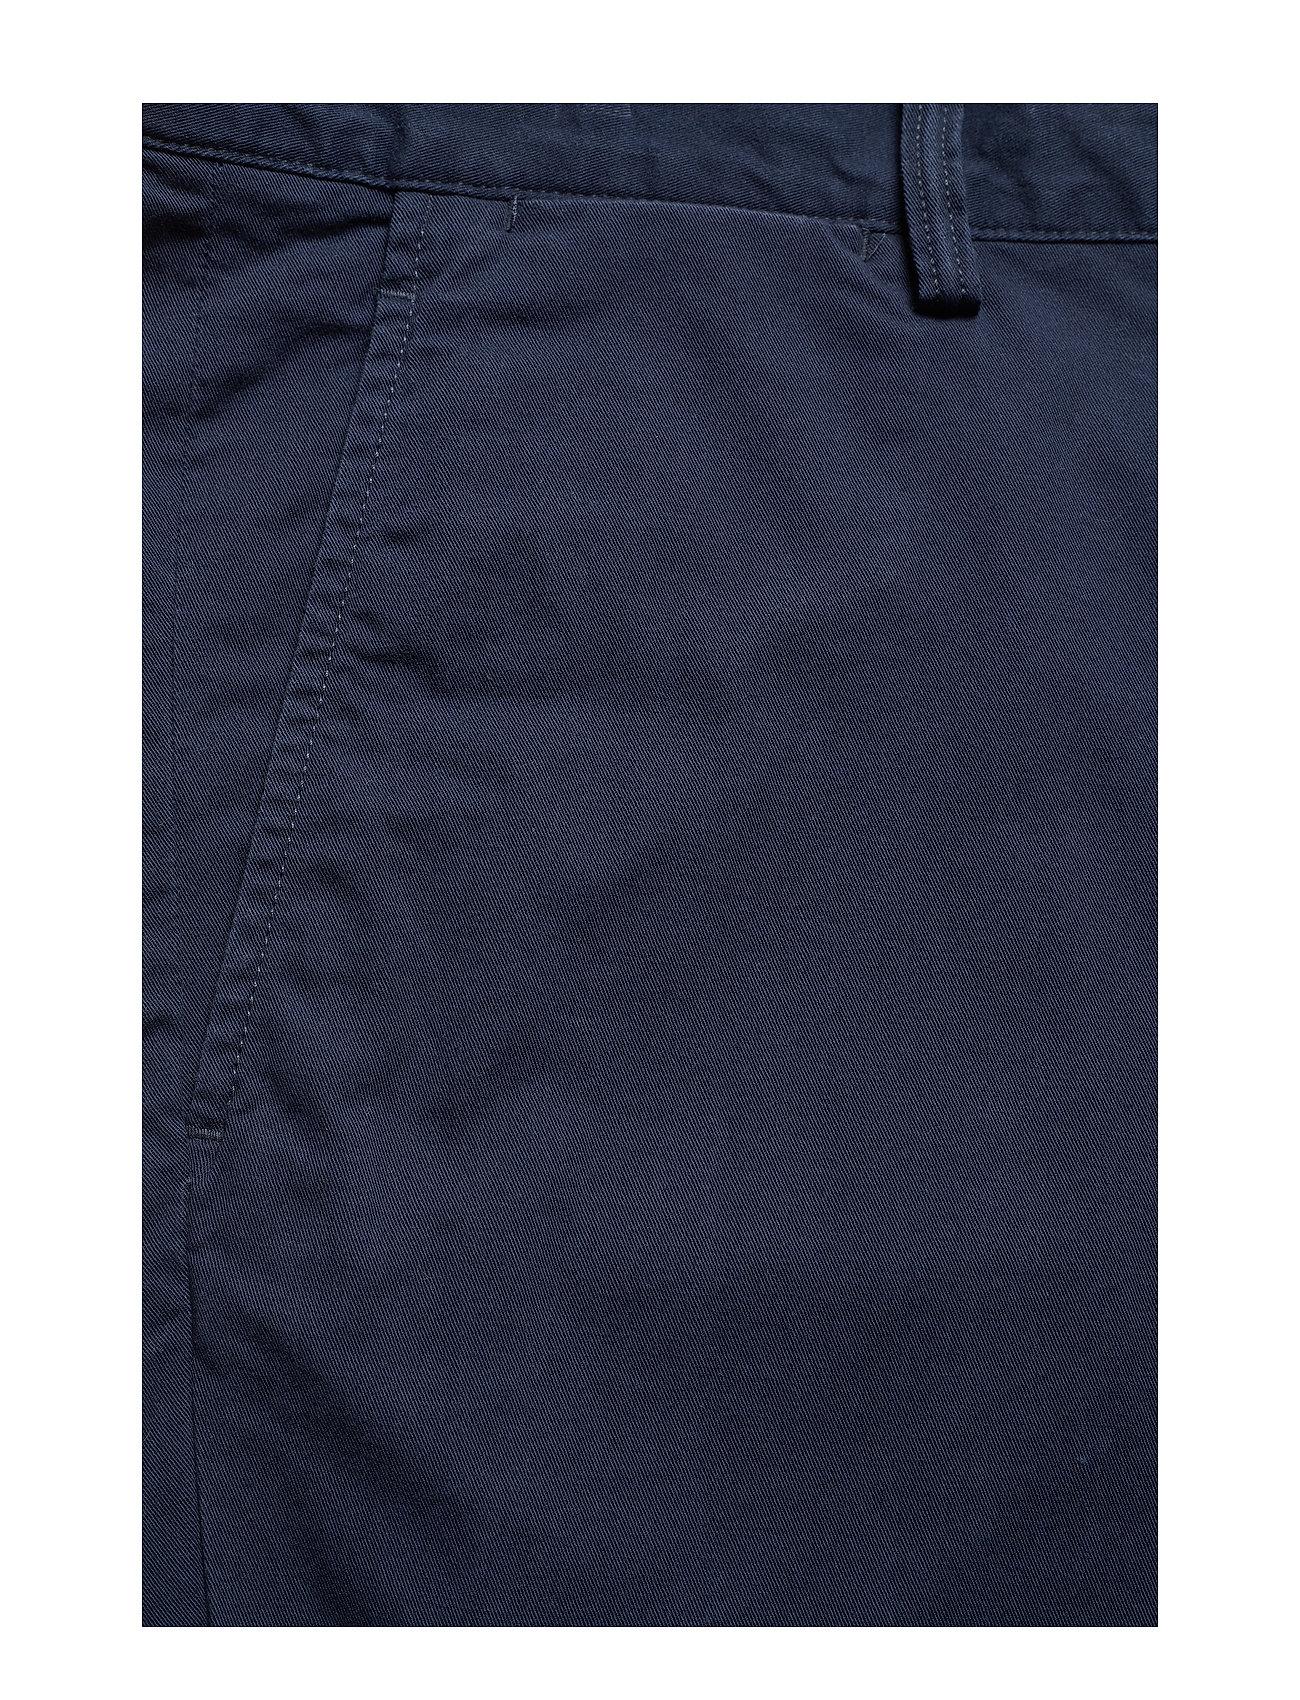 Slim Fit Bedford Short (Nautical Ink) (971.25 kr) - Polo Ralph Lauren